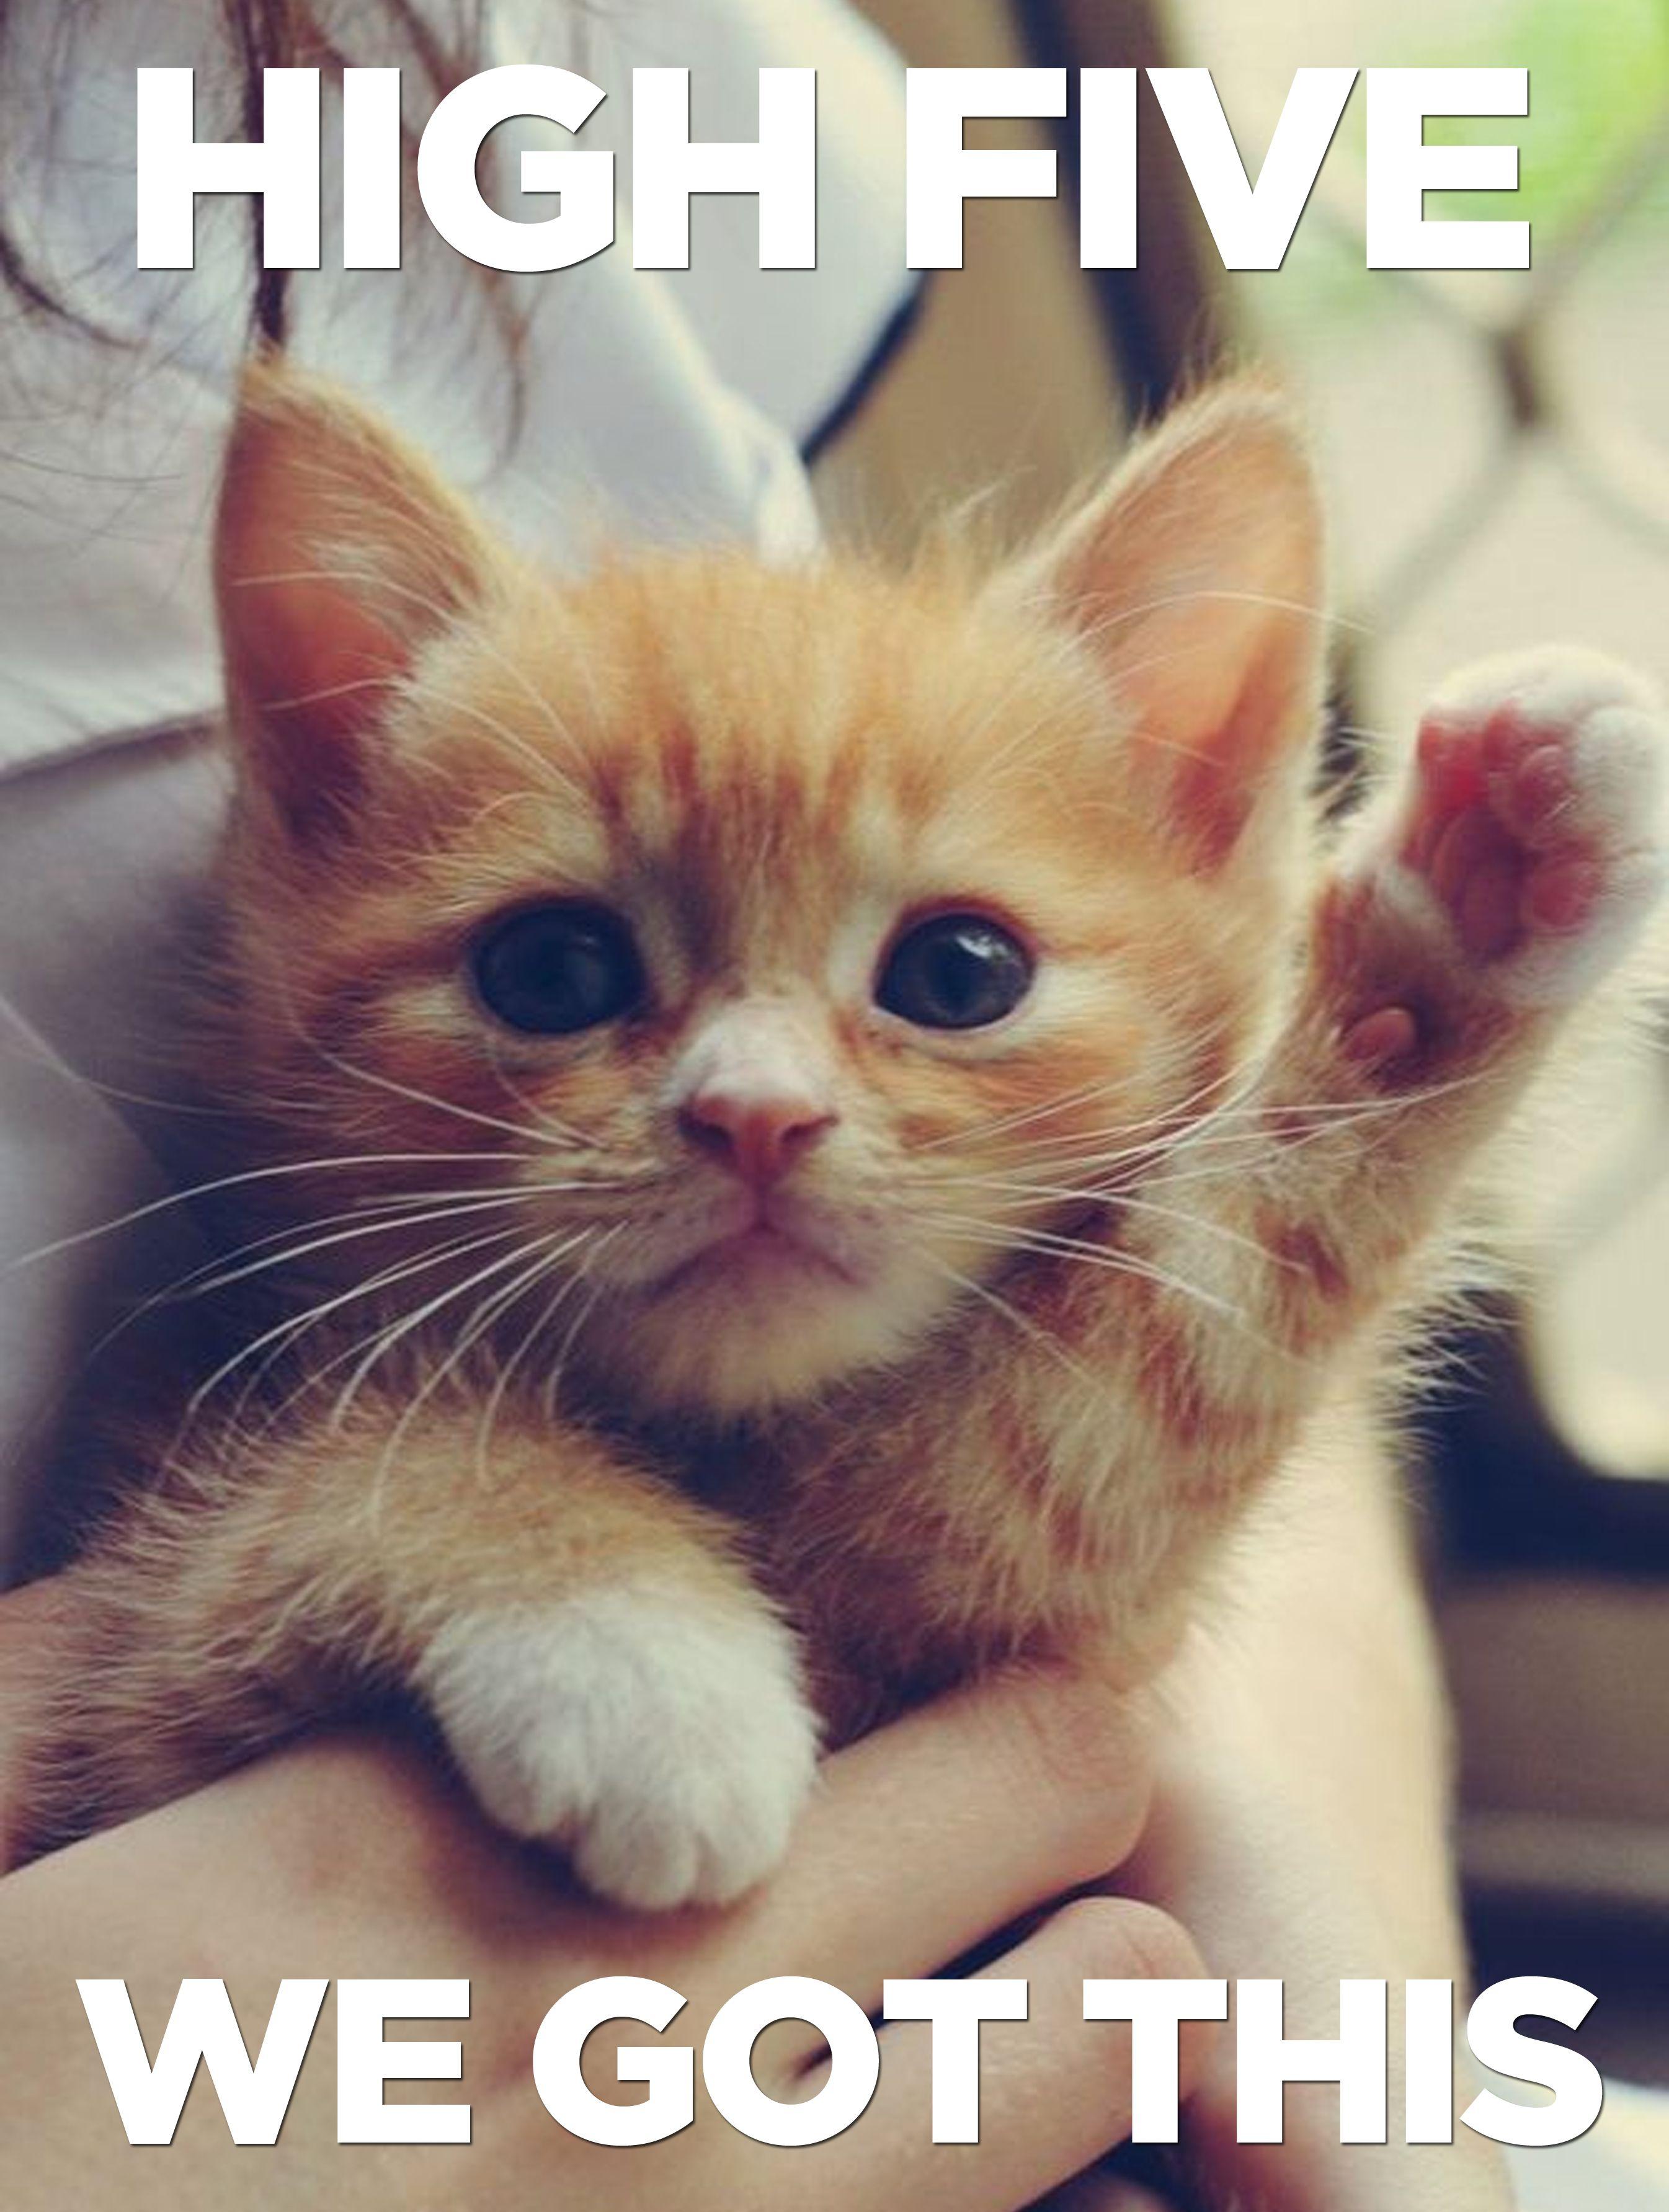 Exam motivation/emergency kitten break | Cute animals ...